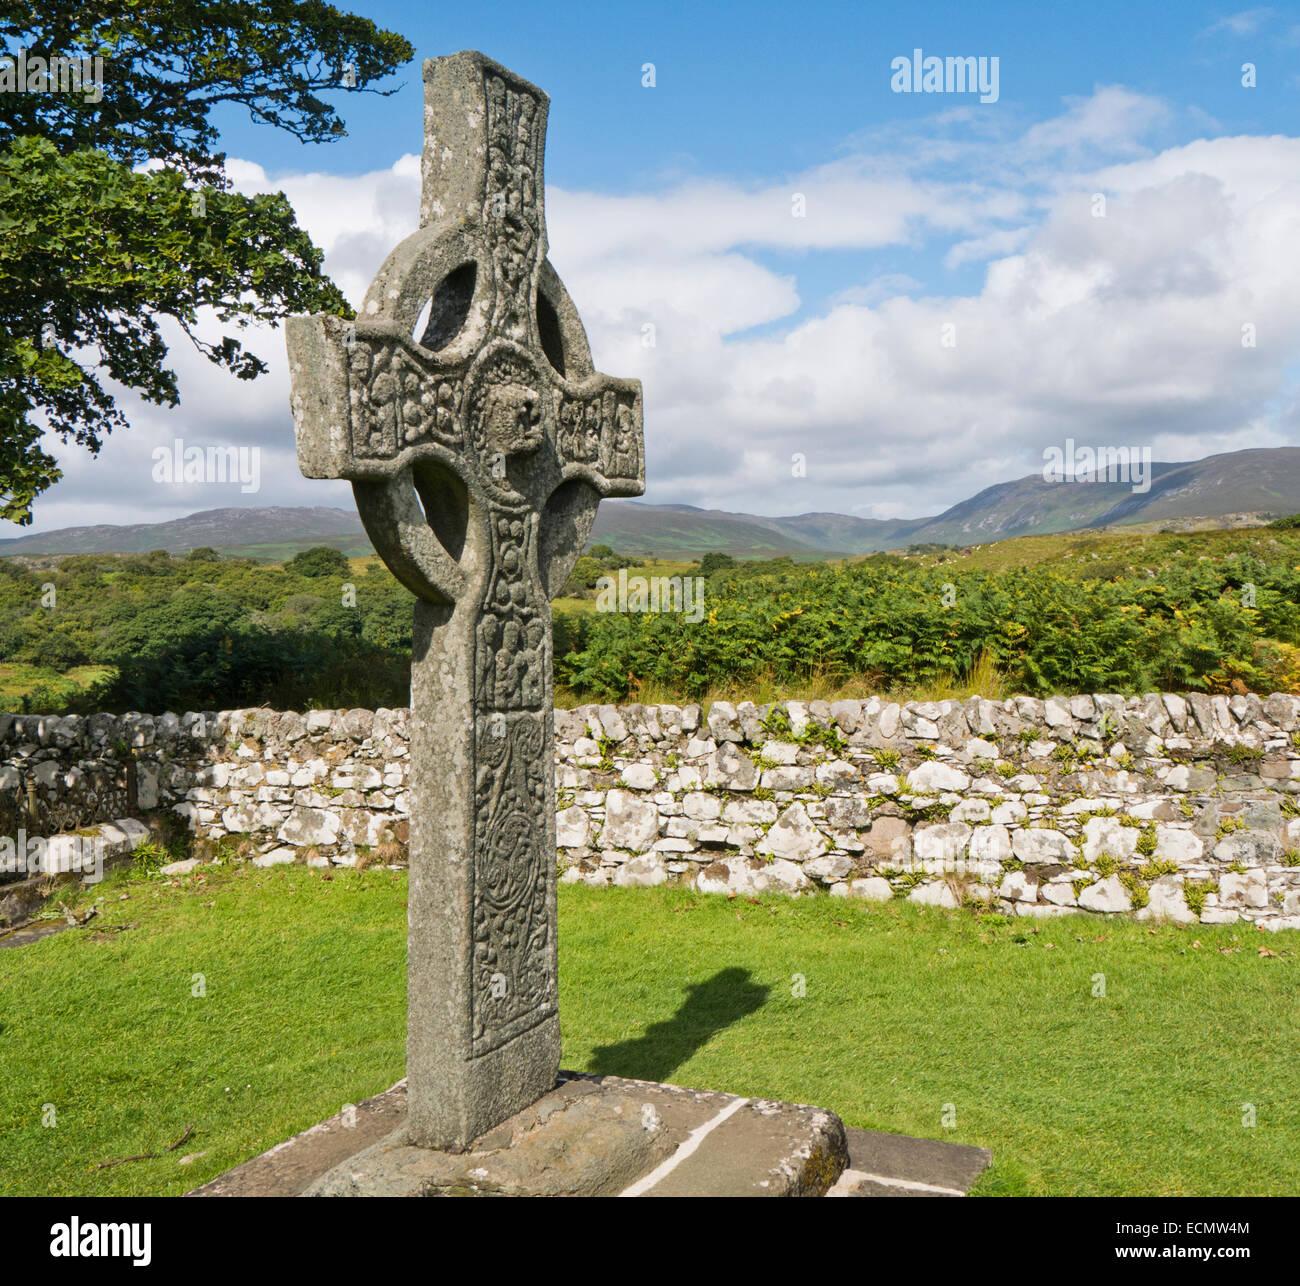 The Kidalton High Cross Islay Scotland - Stock Image